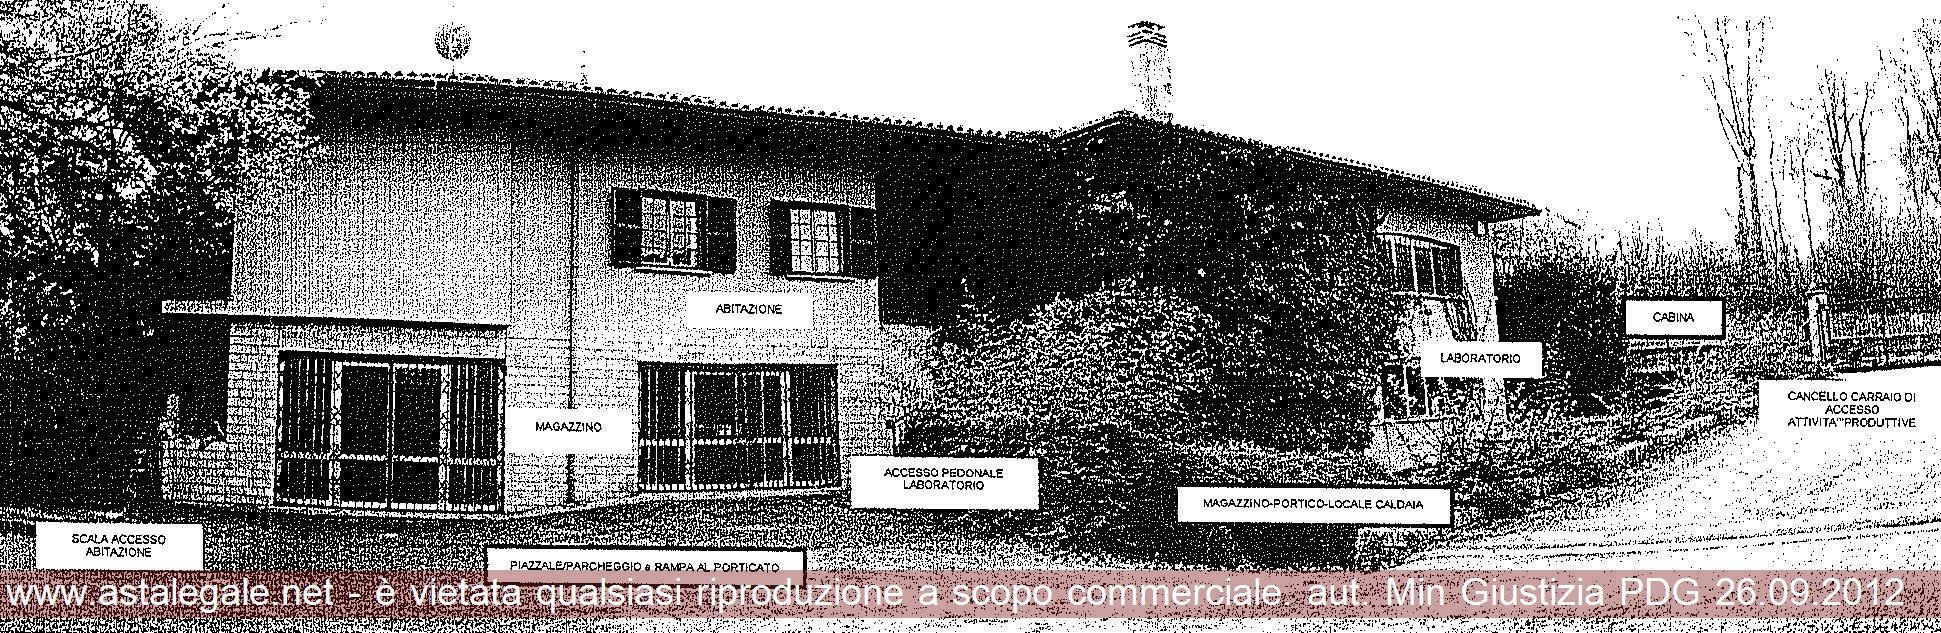 Travedona-monate (VA) Via Ugo Foscolo 273